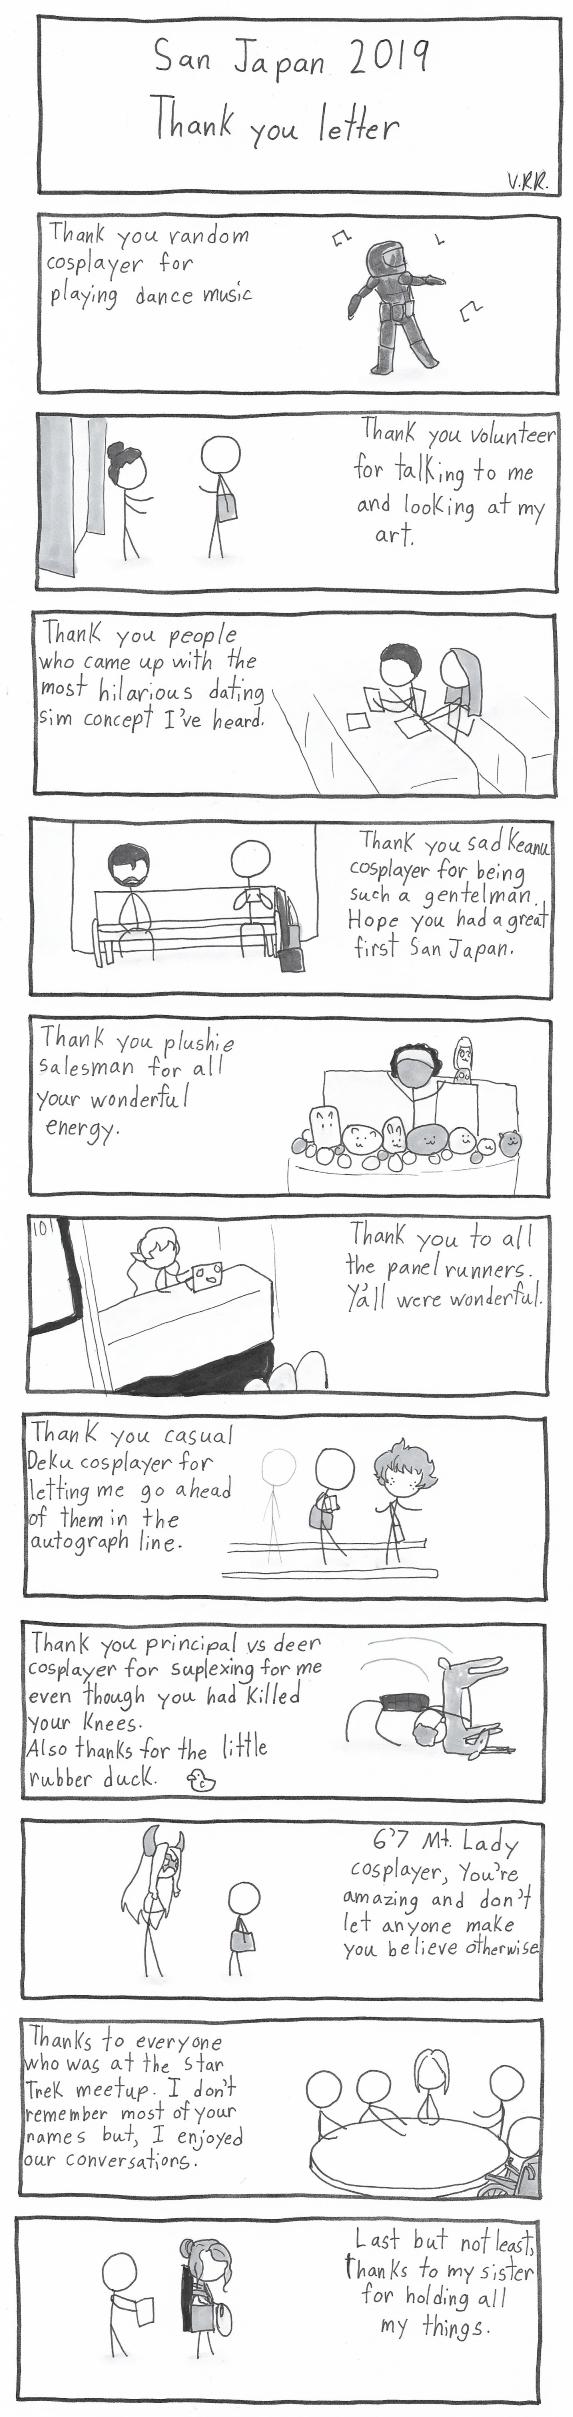 San Japan 2019 Thank You Letter